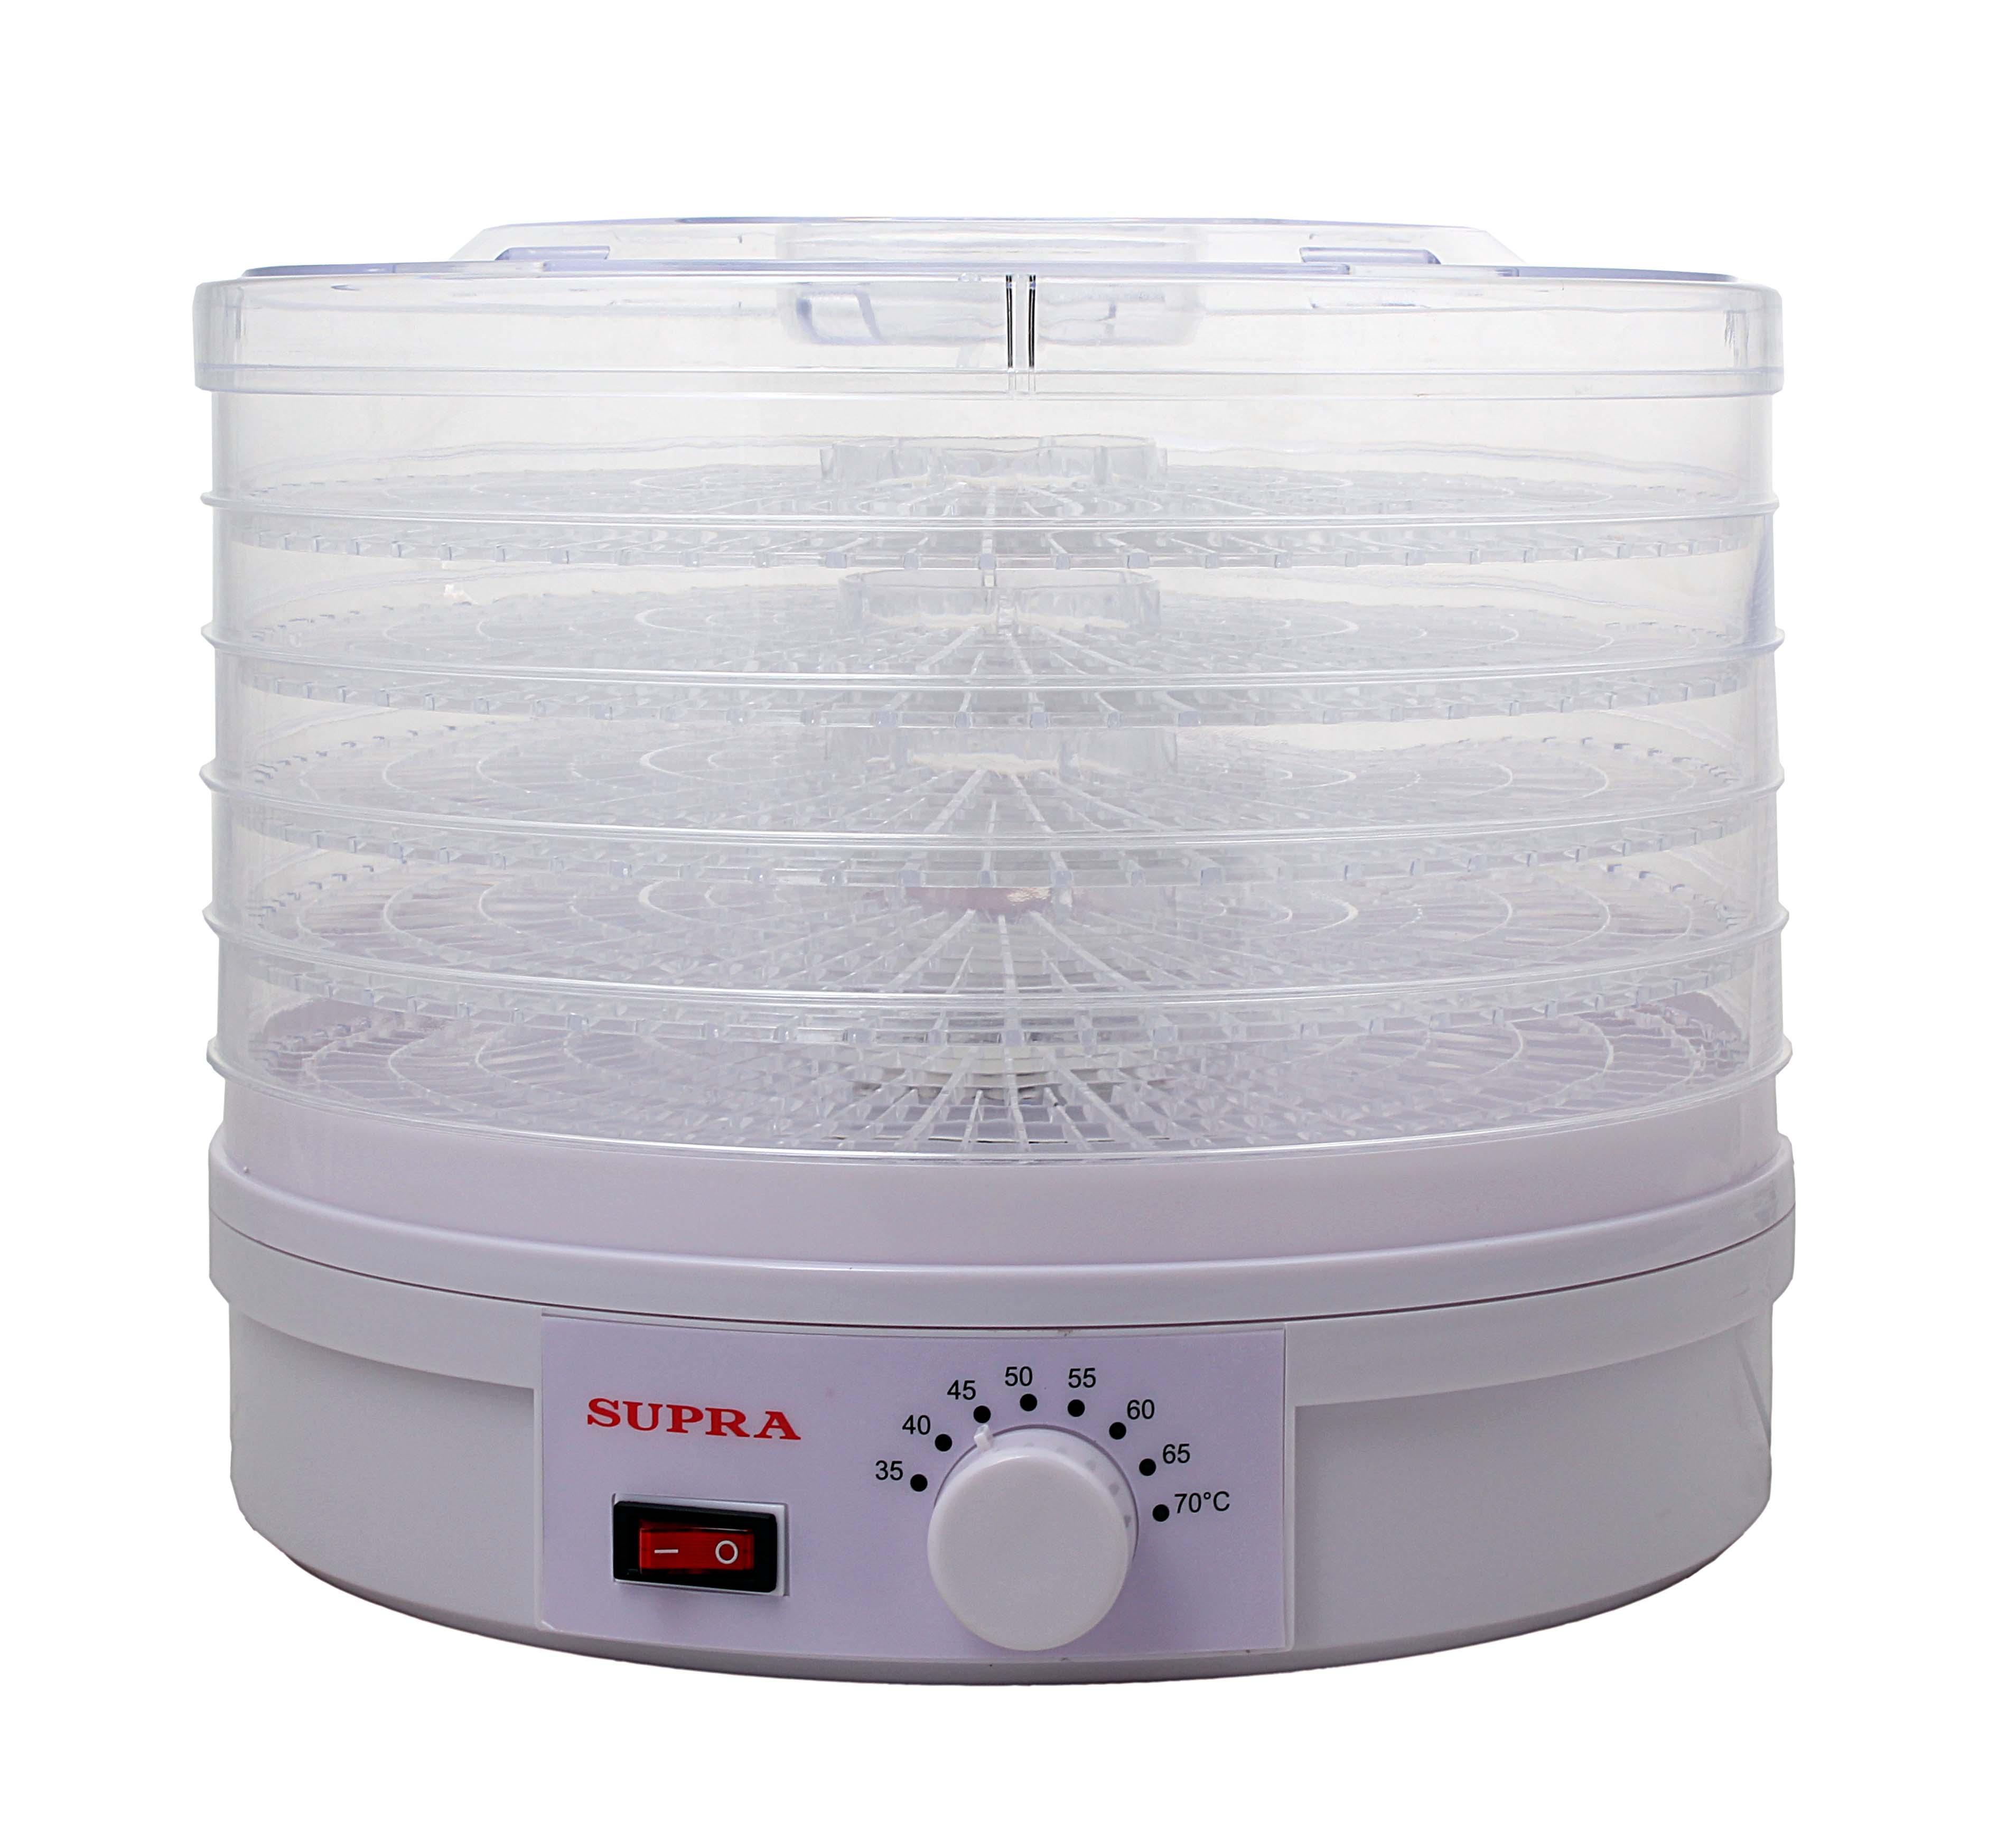 Сушилка Supra Real Brand Technics 1330.000